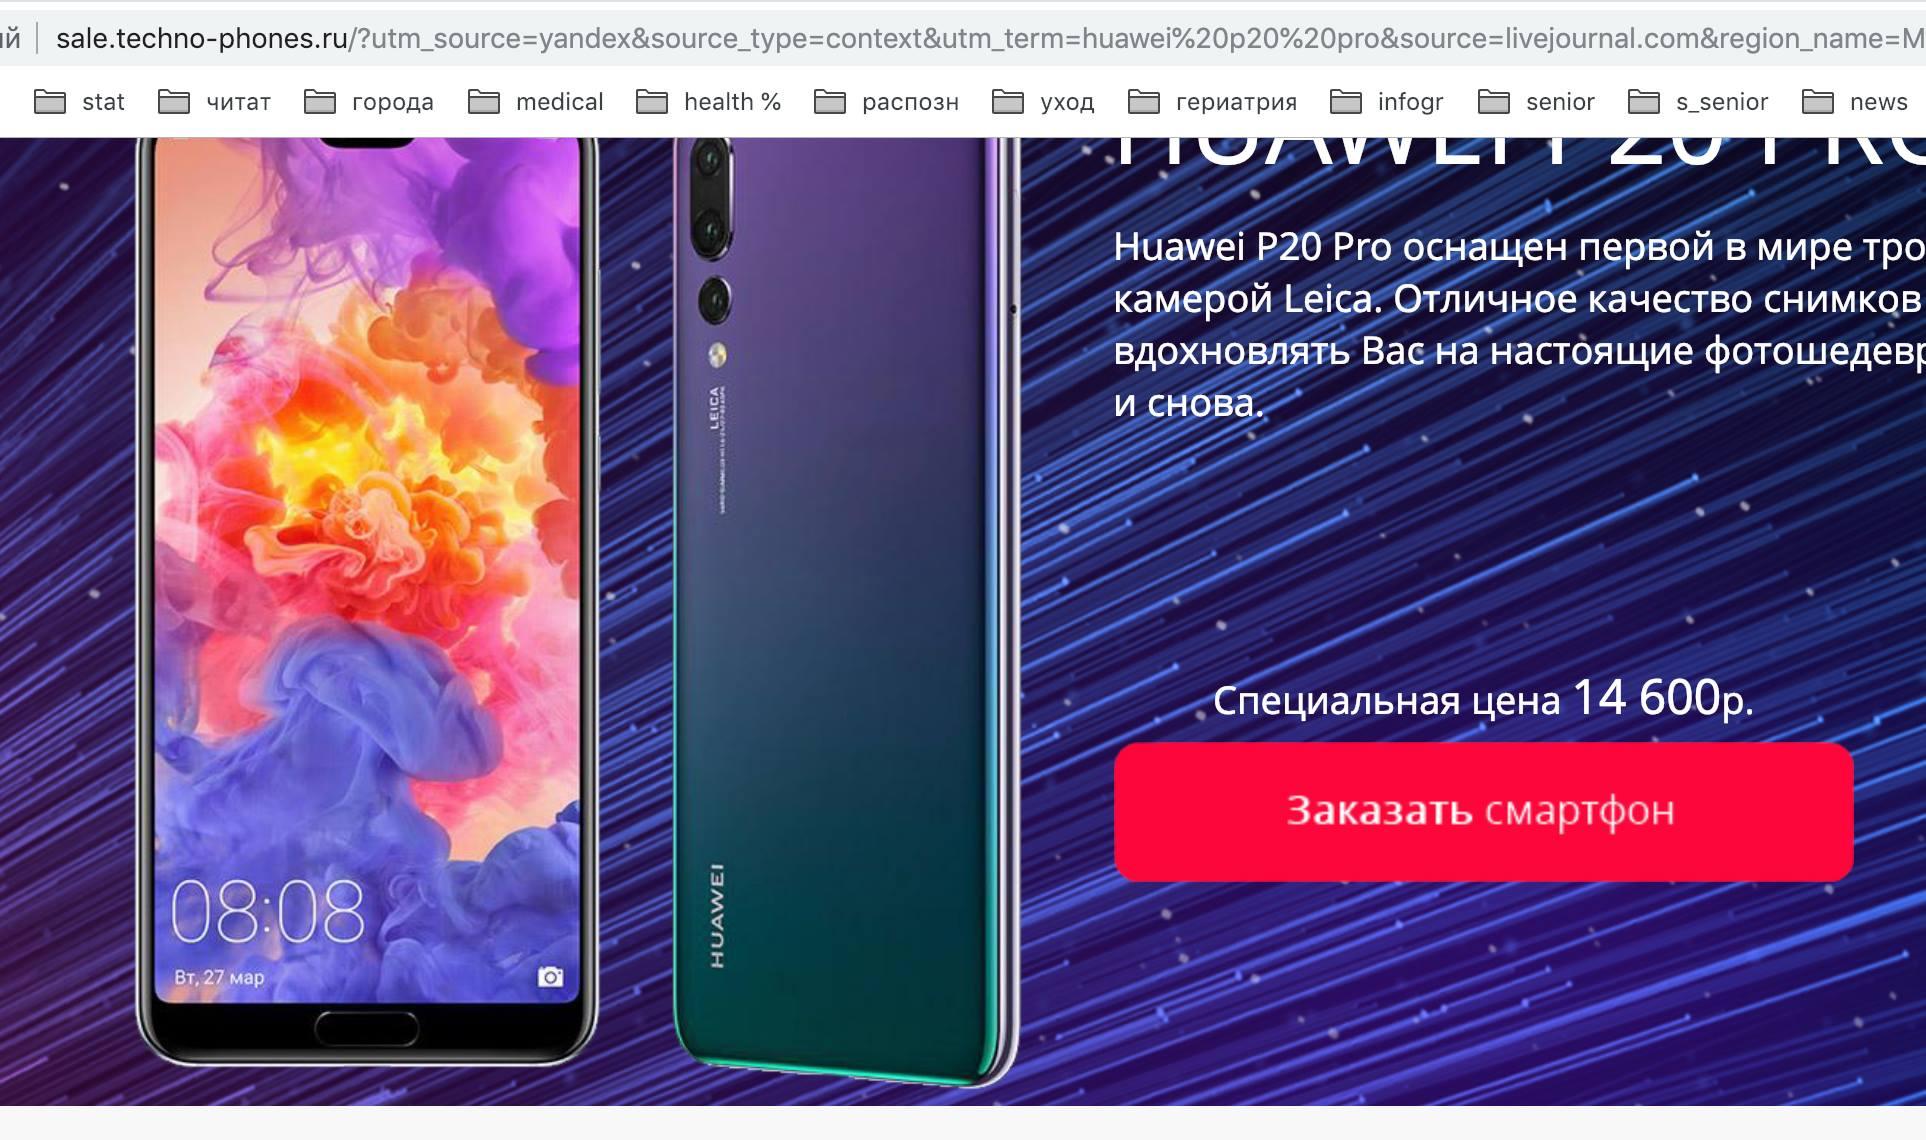 Развод с телефонами Huawei p20 Pro по 14990 рублей